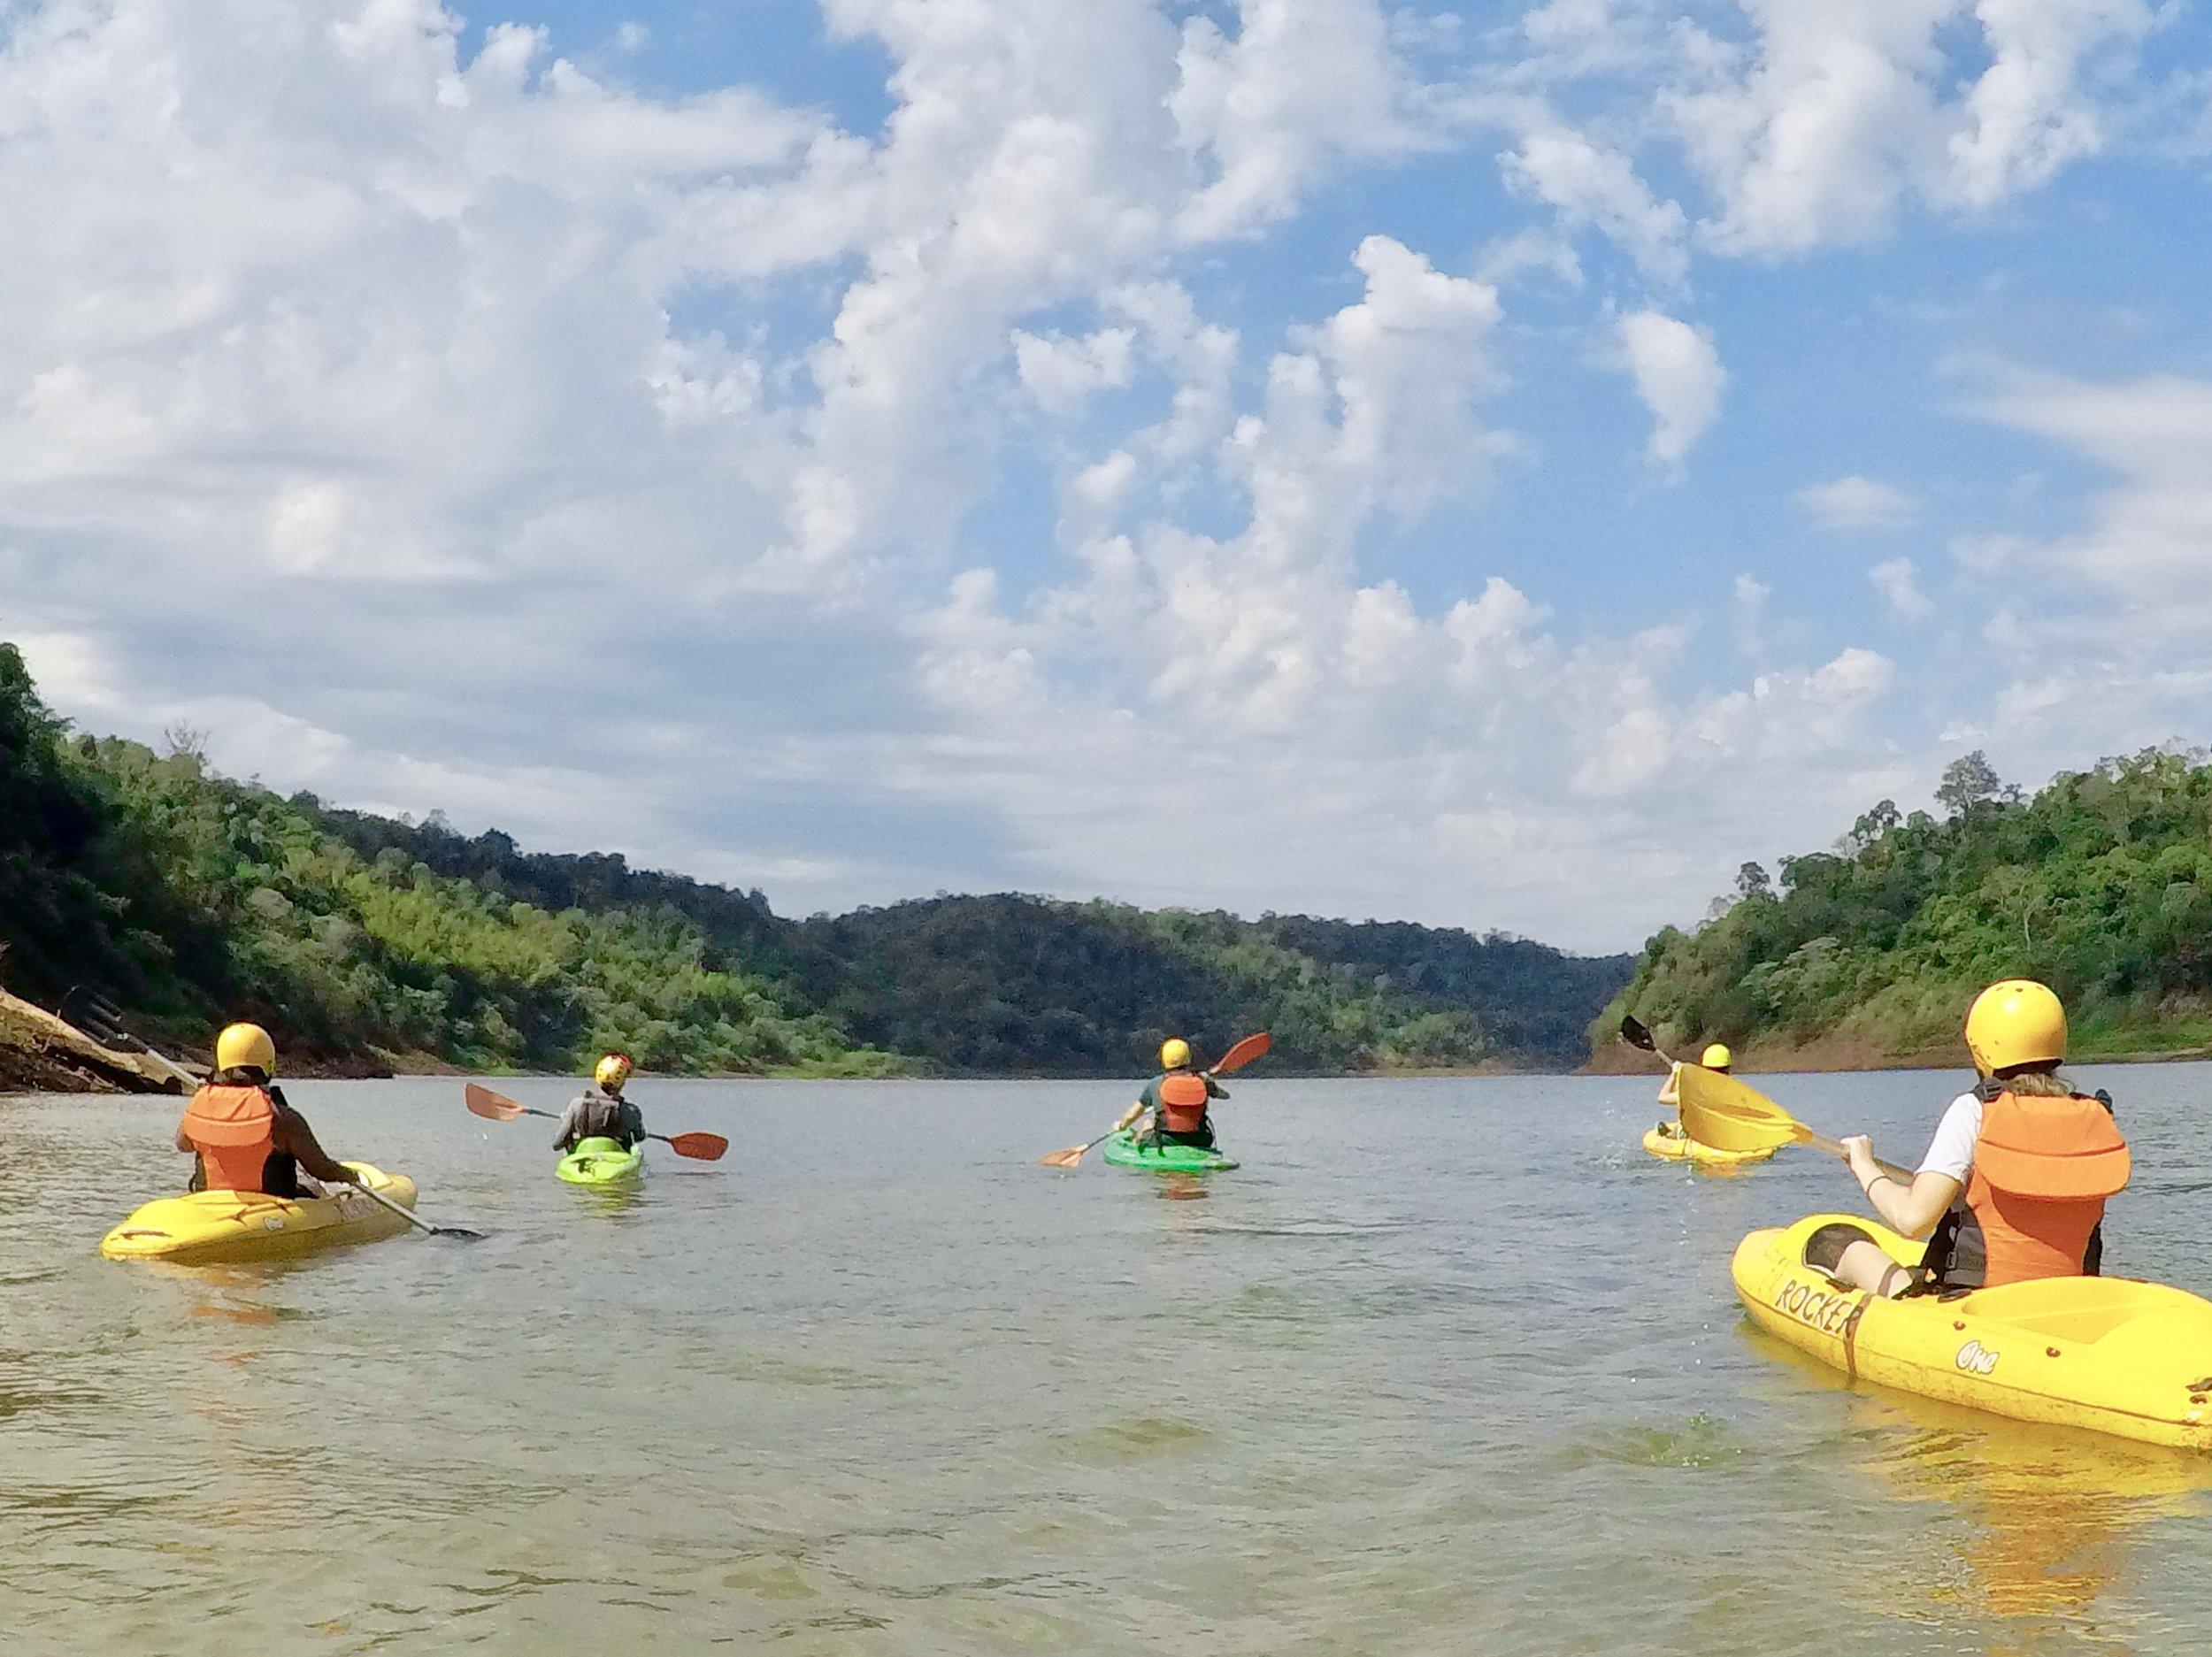 Kayak on the Iguazu River in Brazil